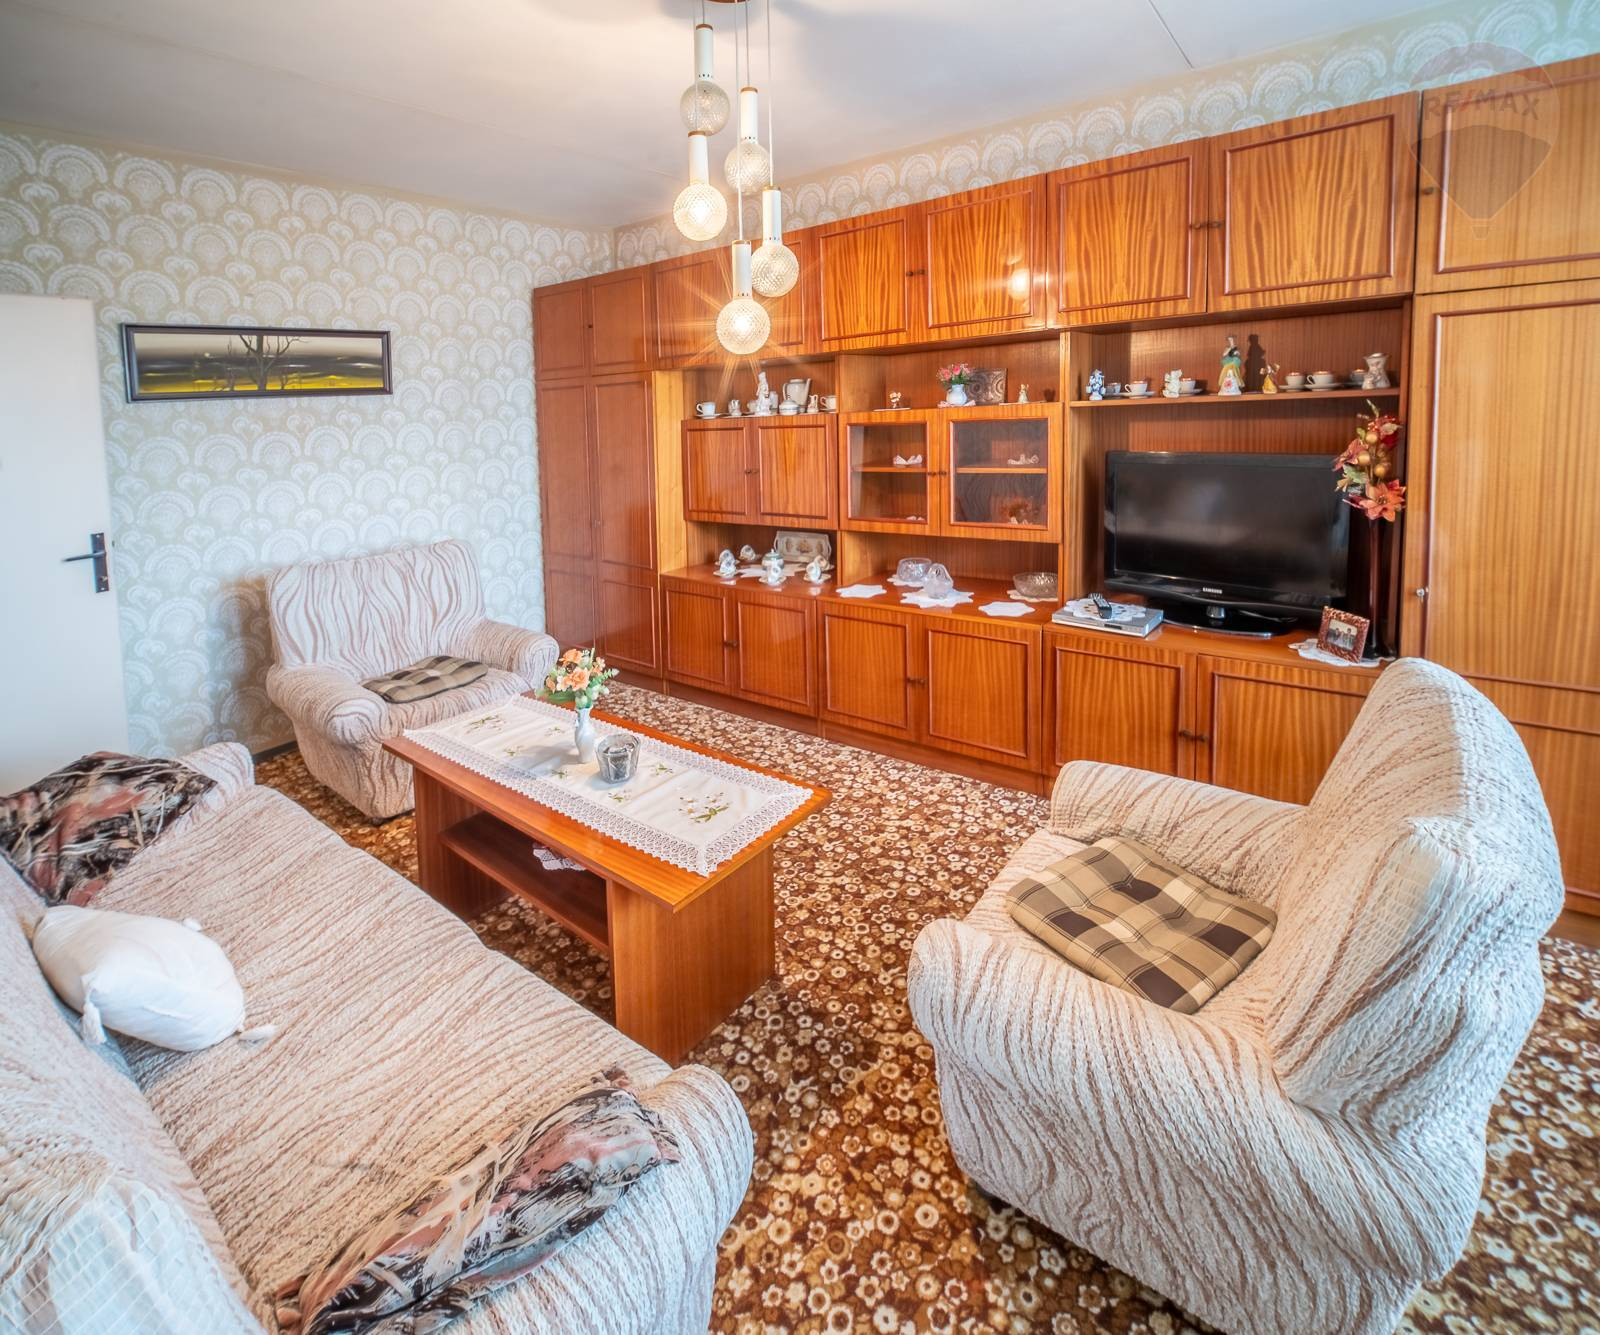 Predaj bytu (3 izbový) 74 m2, Zvolen -